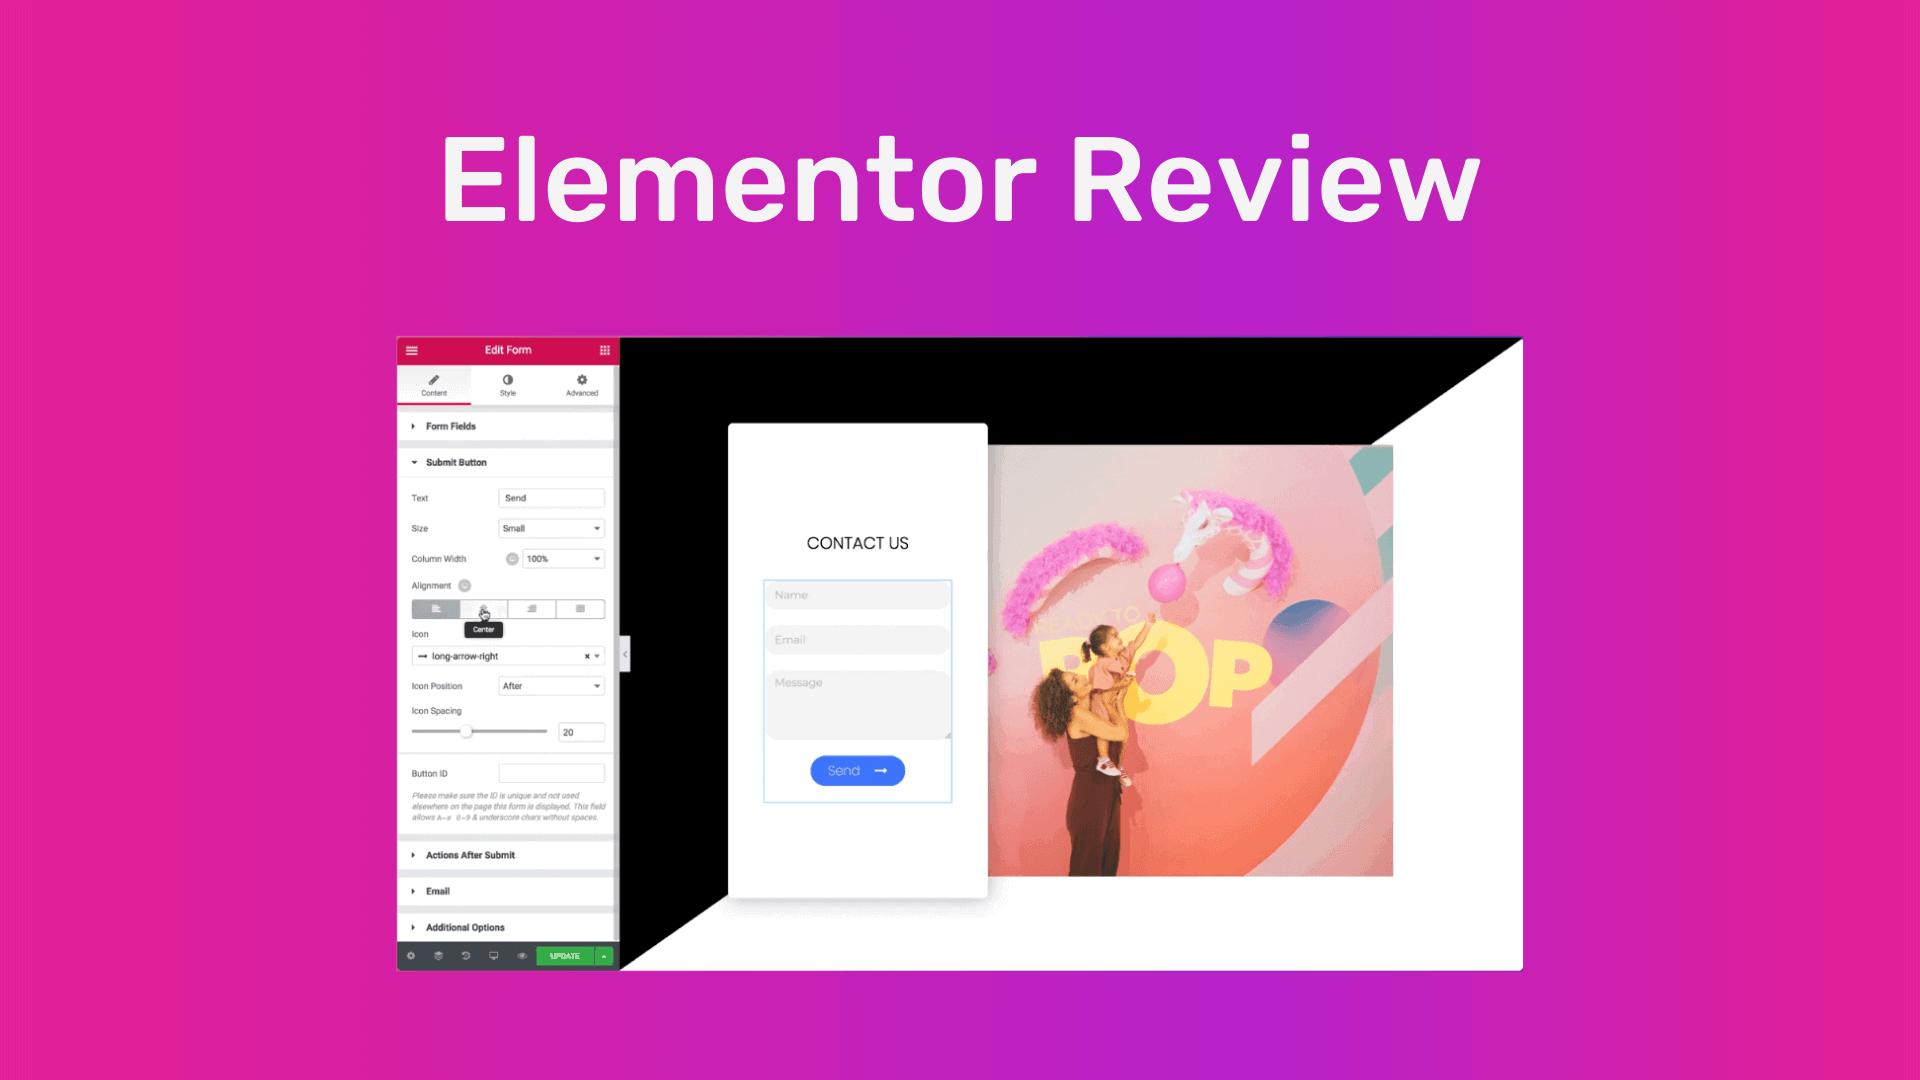 Elementor Review - The Best Drag & Drop Builder For WordPress